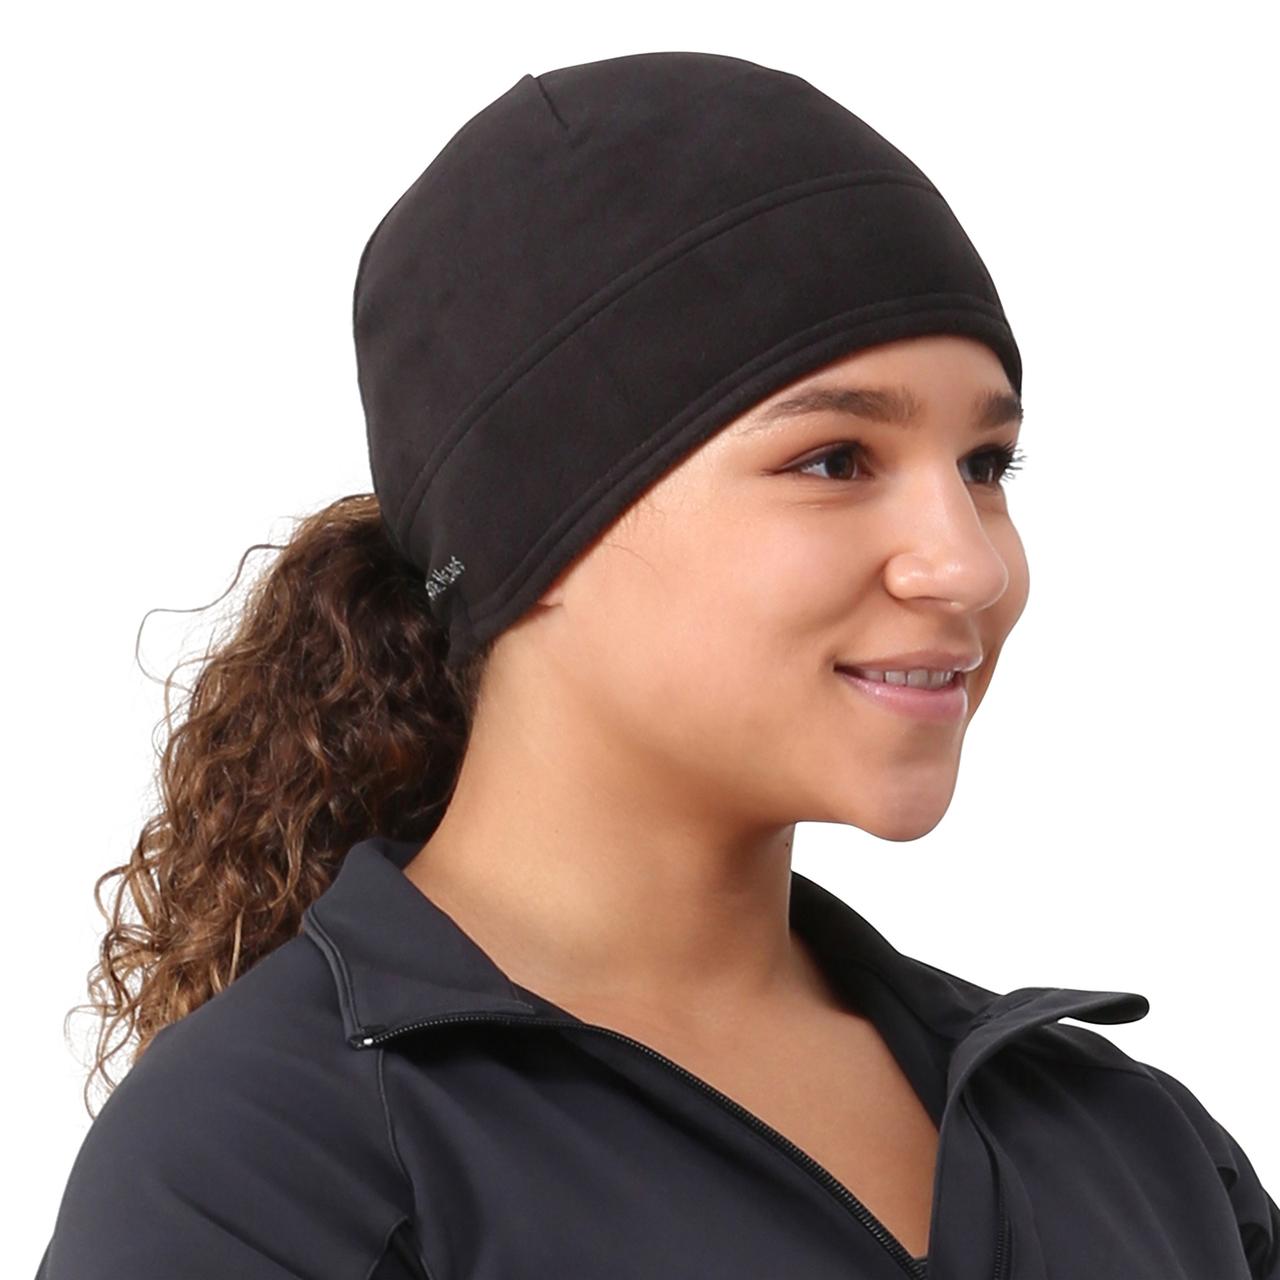 TrailHeads Women s Microfleece Ponytail Hat - solid black af91fccde95